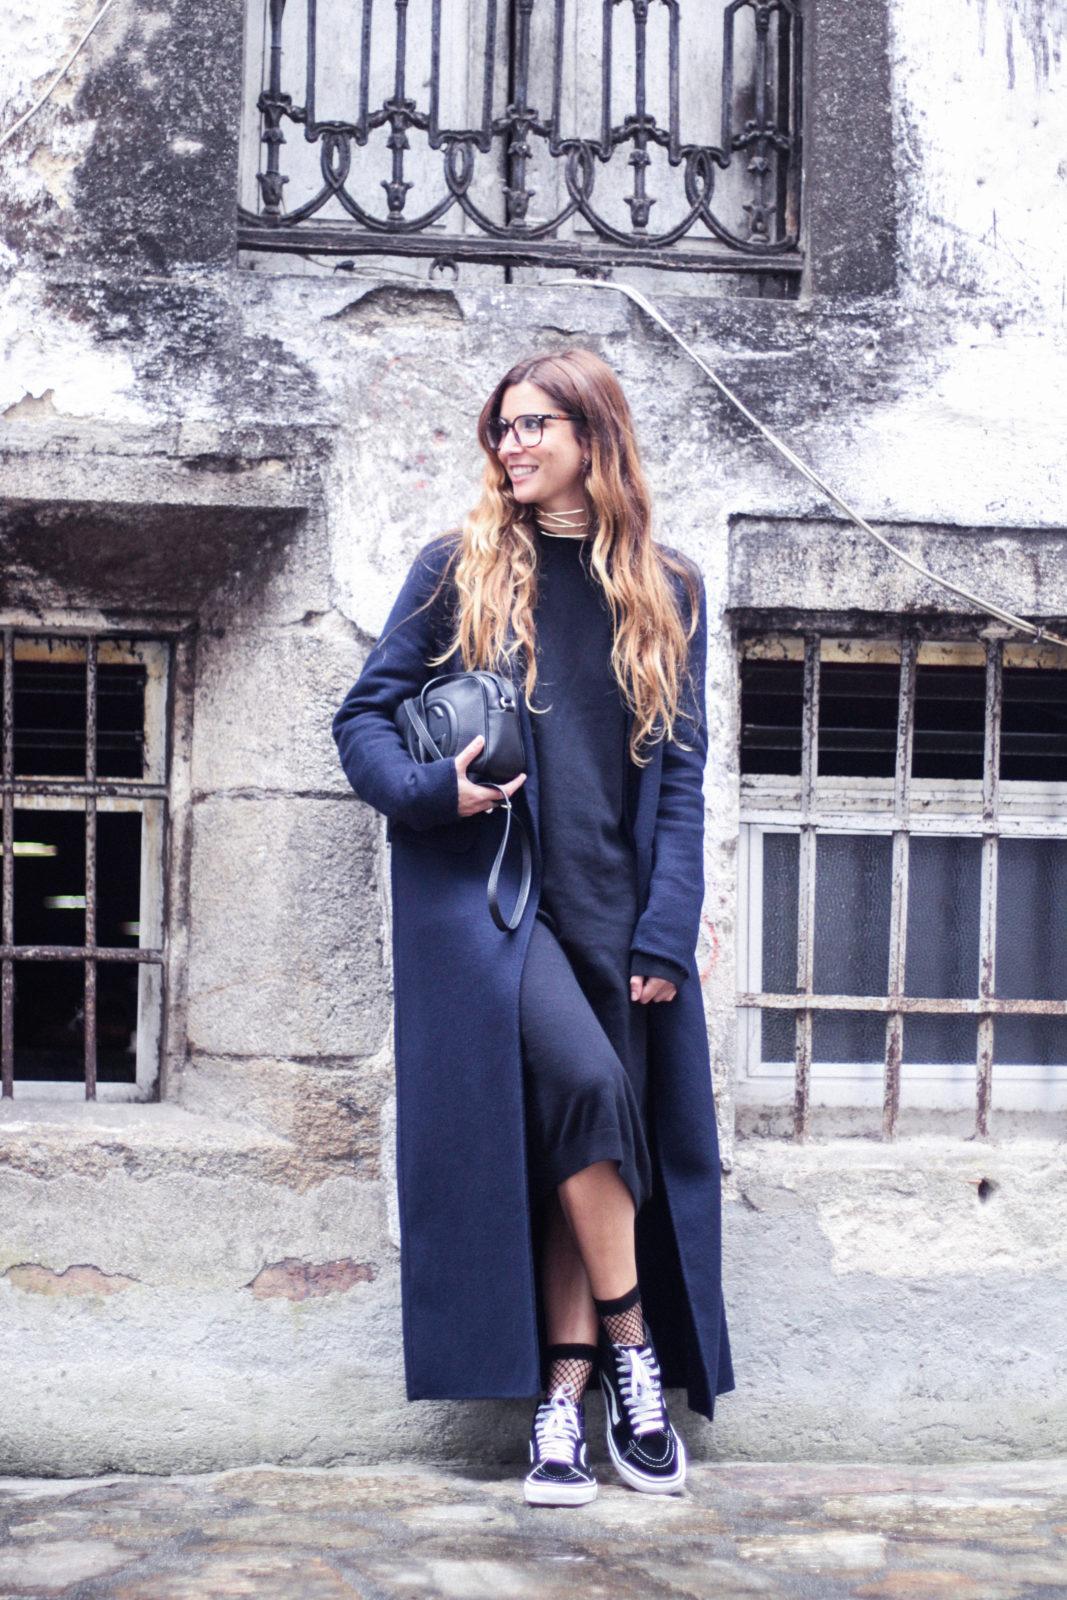 vestido_de_punto_midi_vans_calcetines_rejilla_choker_metalico_happiness_boutique_abrigo_largo_gucci_street_style_fall_2016_donkeycool-10